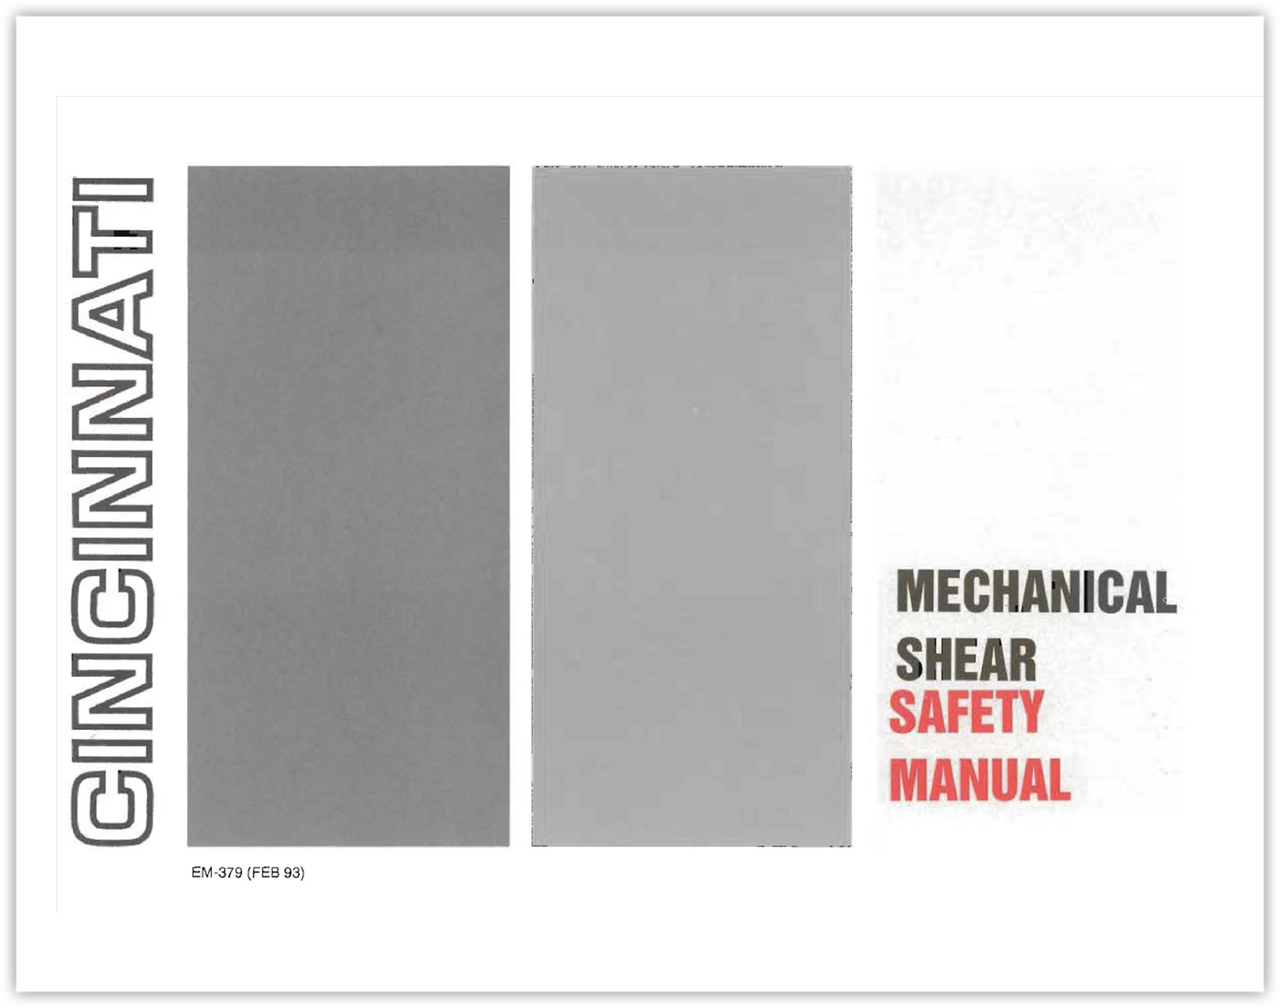 EM-379 Mechanical Shear Safety Manual